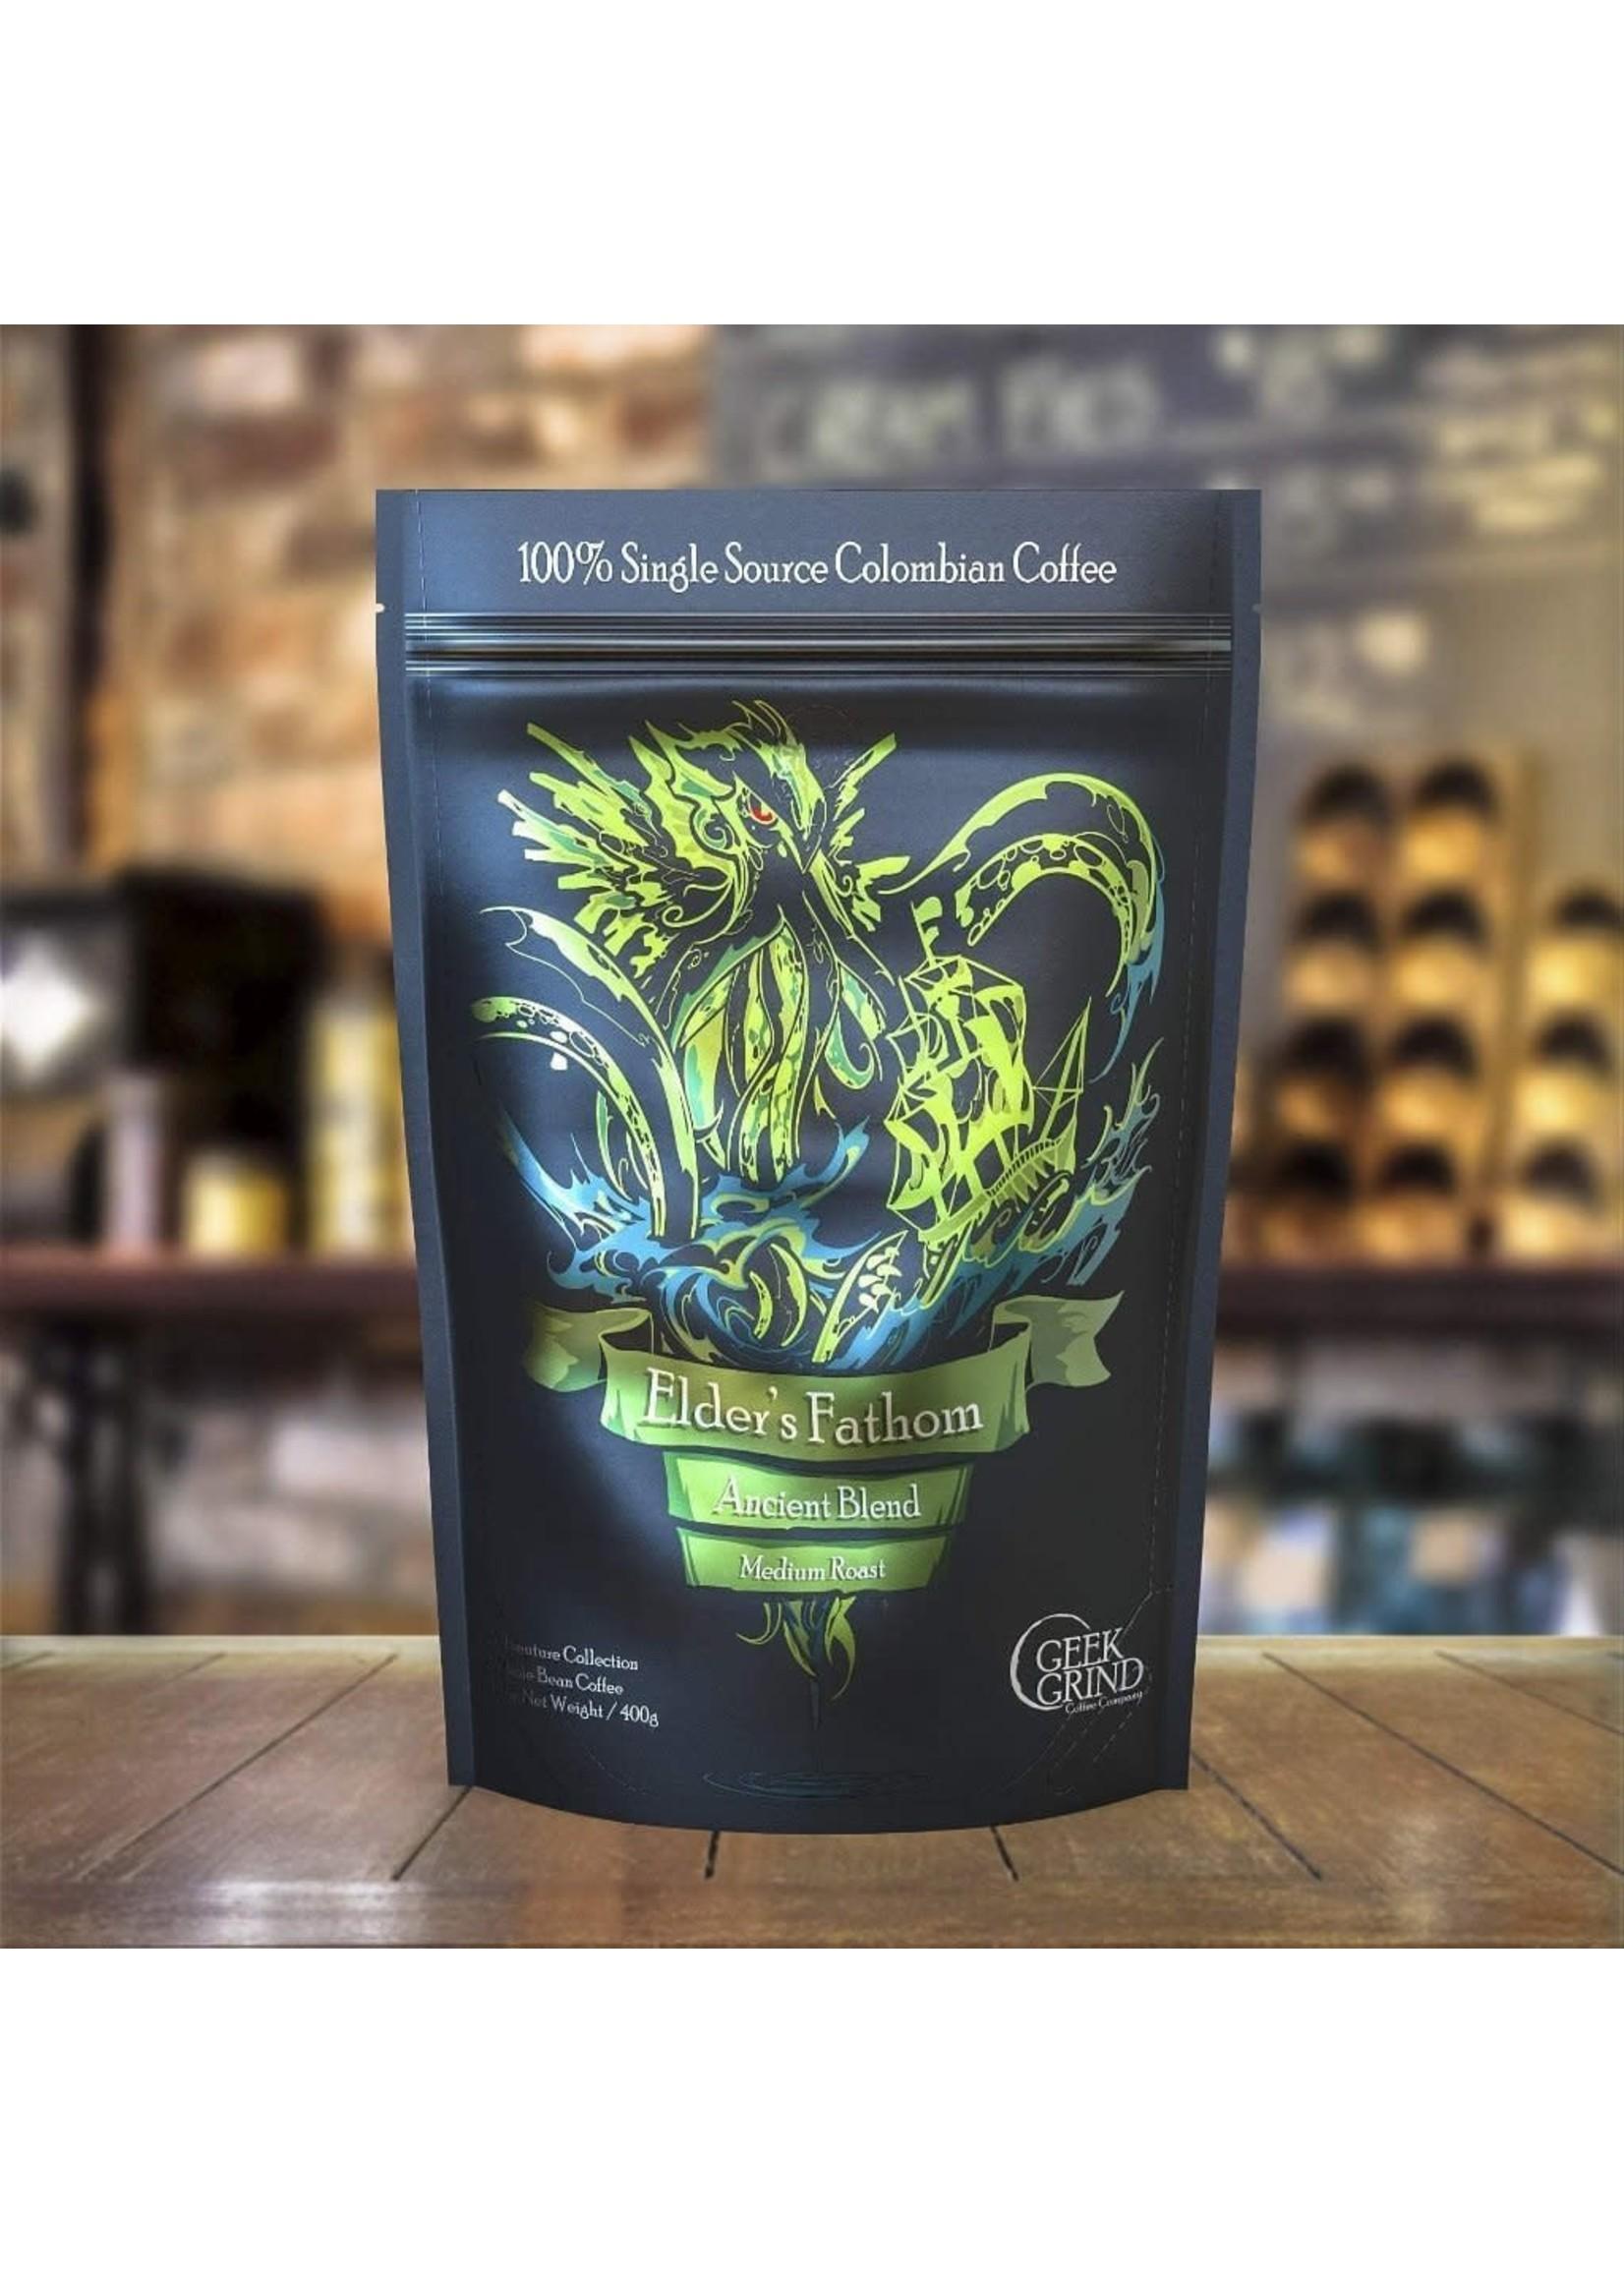 Geek Grind Elder's Fathom - Ancient Blend - Medium Roast Coffee- 12 oz. Individual Bag